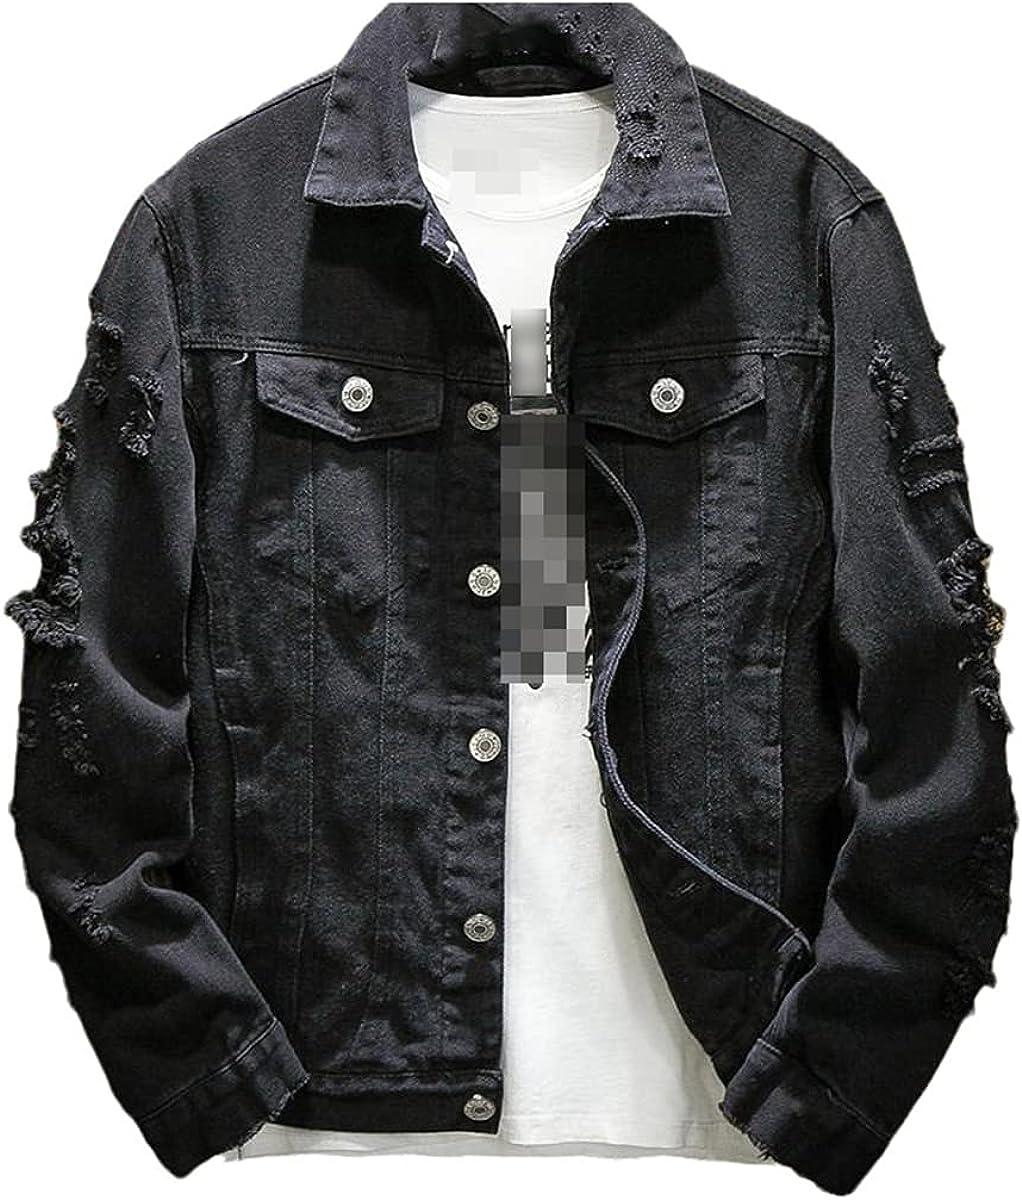 Fall Ripped Denim Jacket Men's Jacket Slim Solid Casual Jacket Cotton Large Size Hip Hop Jeans Jacket